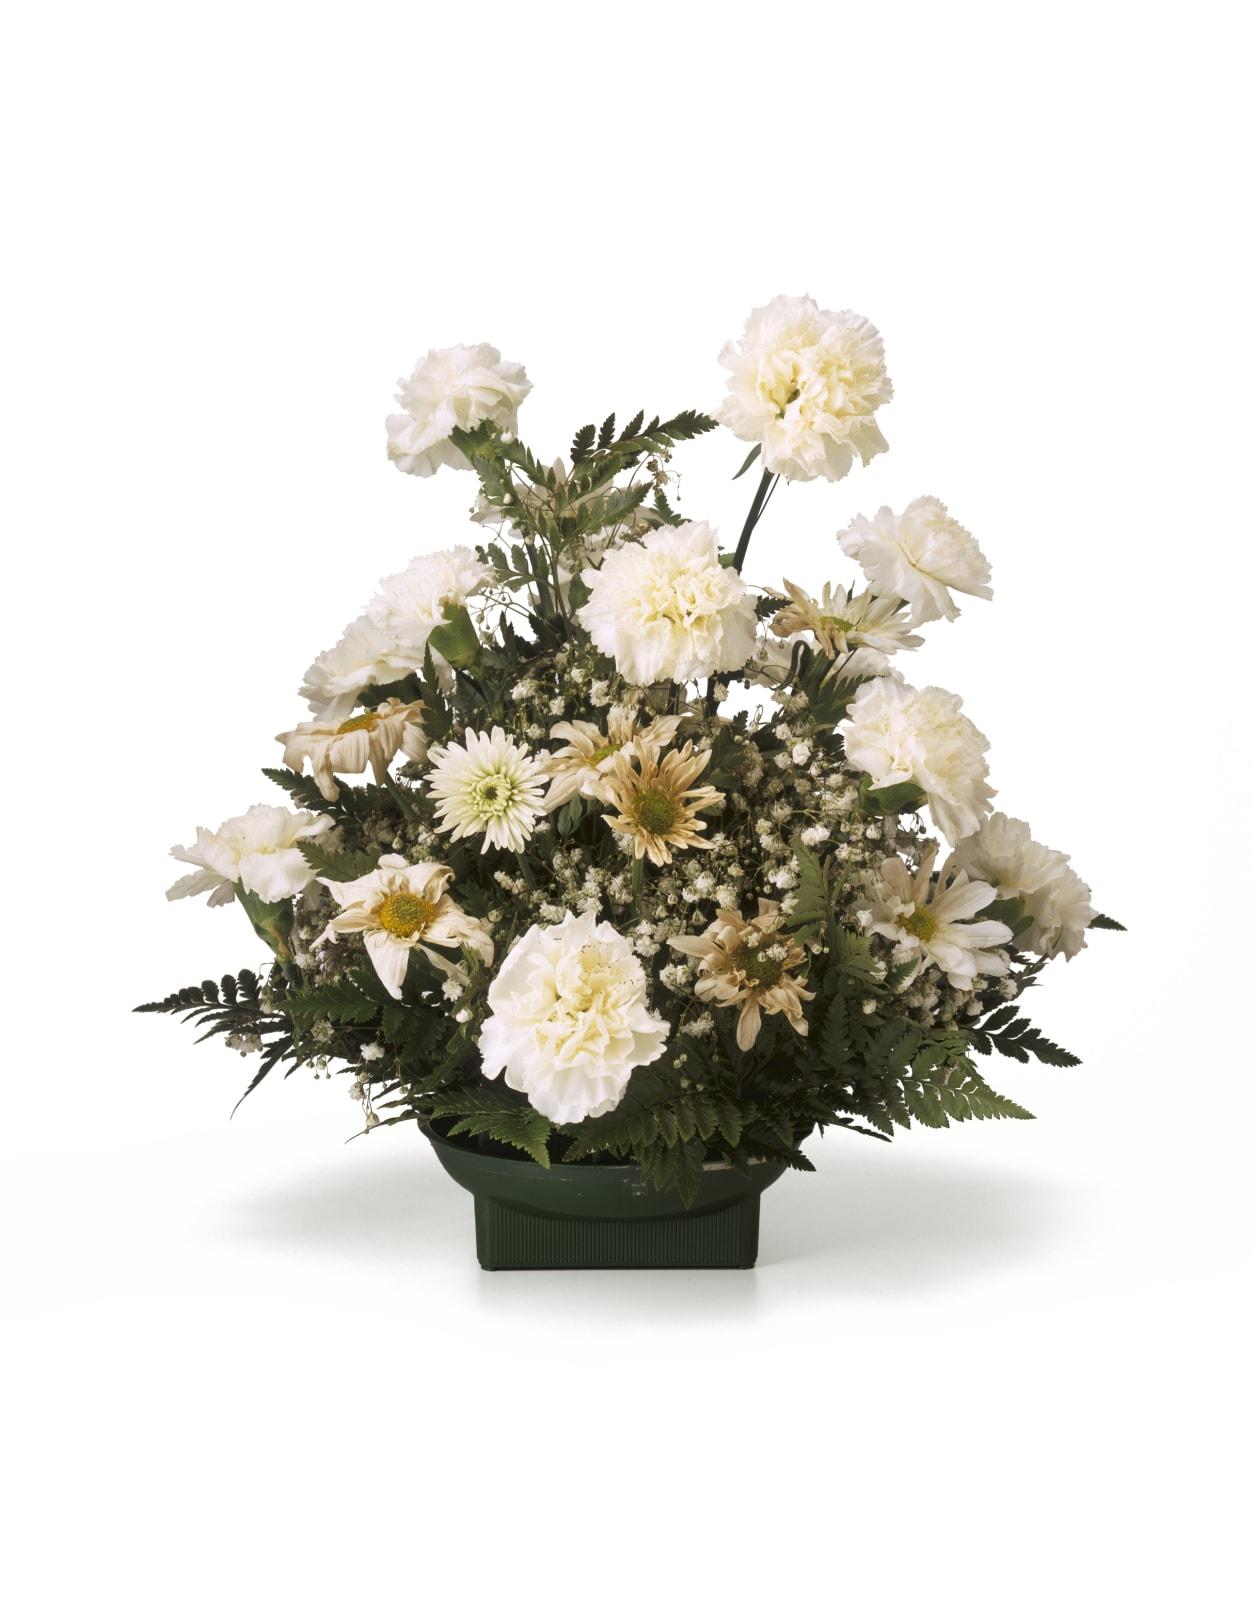 Chuck Ramirez, Quarantine: White Carnations, 2000